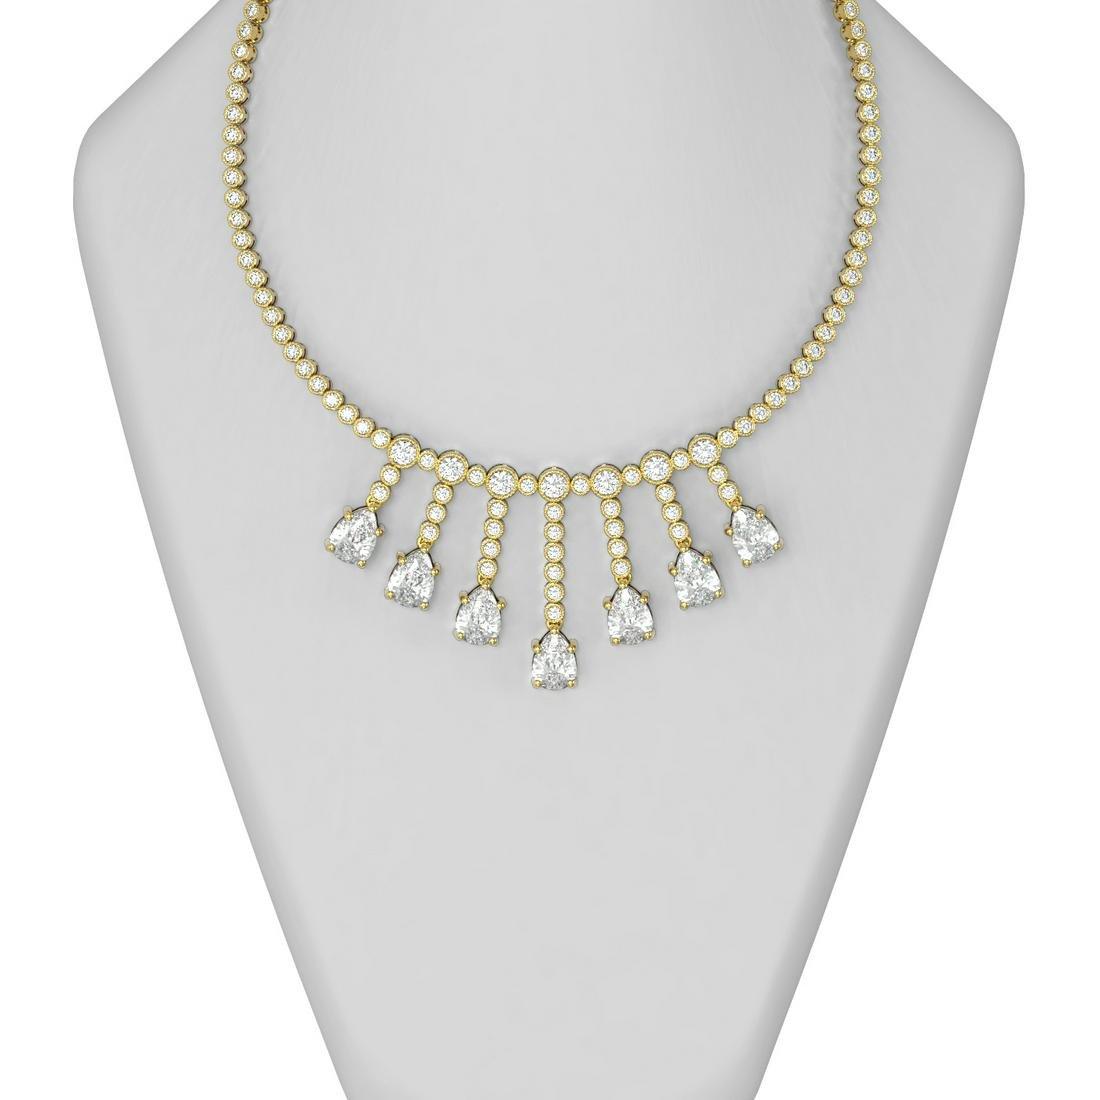 28 ctw Diamond Necklace 18K Yellow Gold - REF-10099F3M